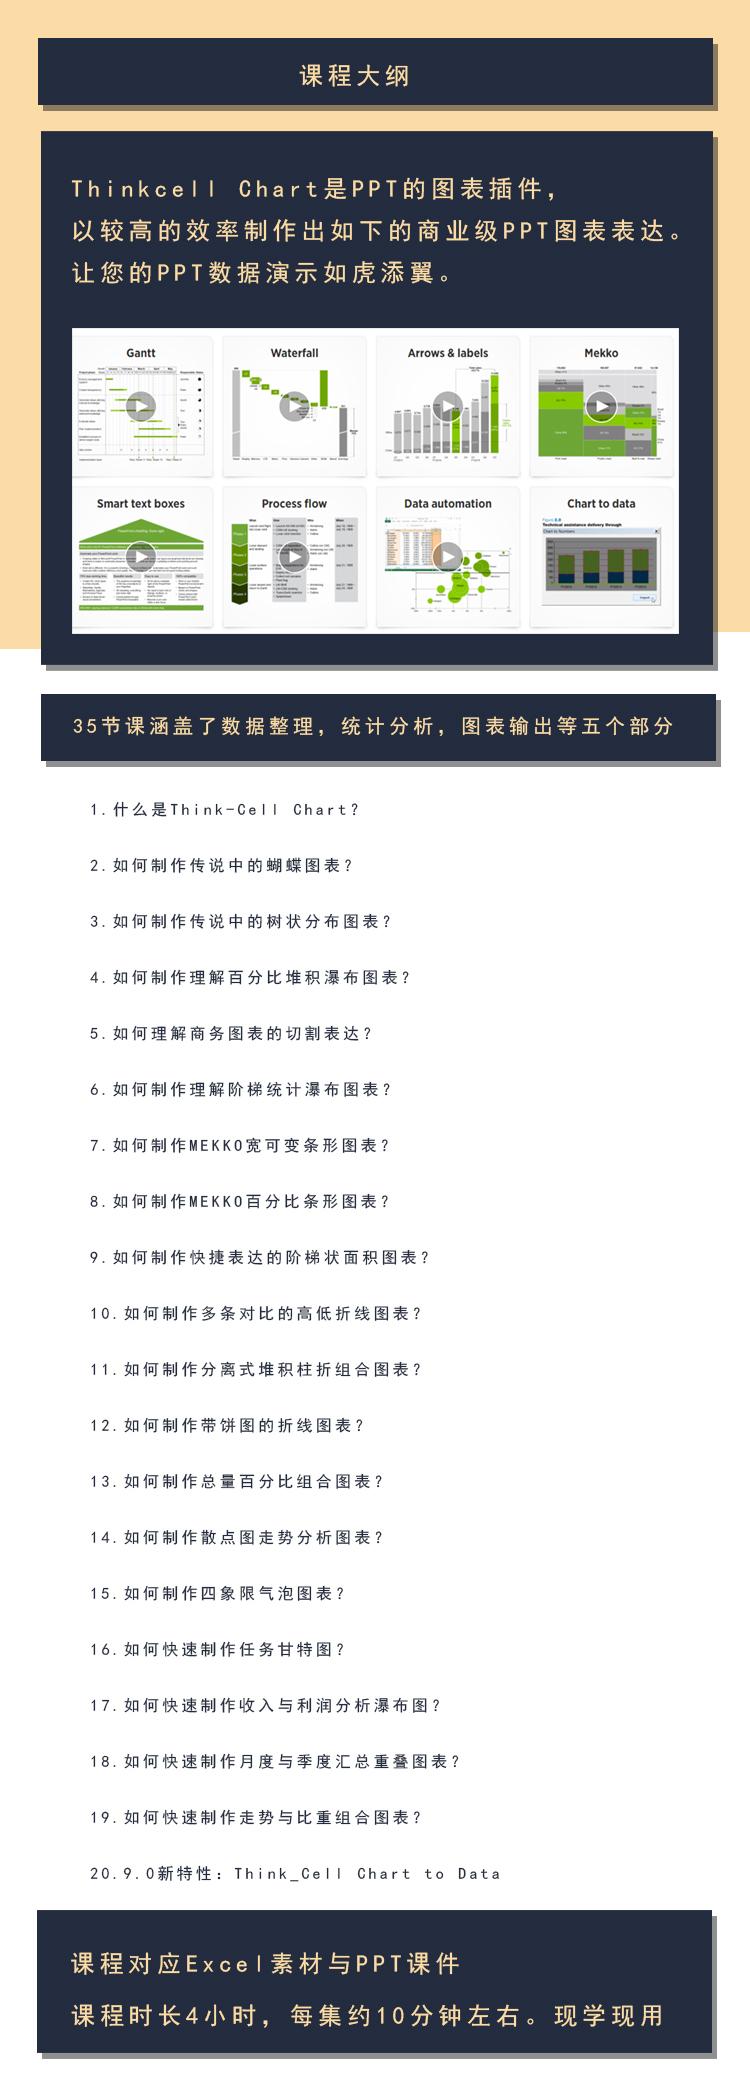 Thinkcell-Chart  企业咨询级PPT图表制作教程2.jpg